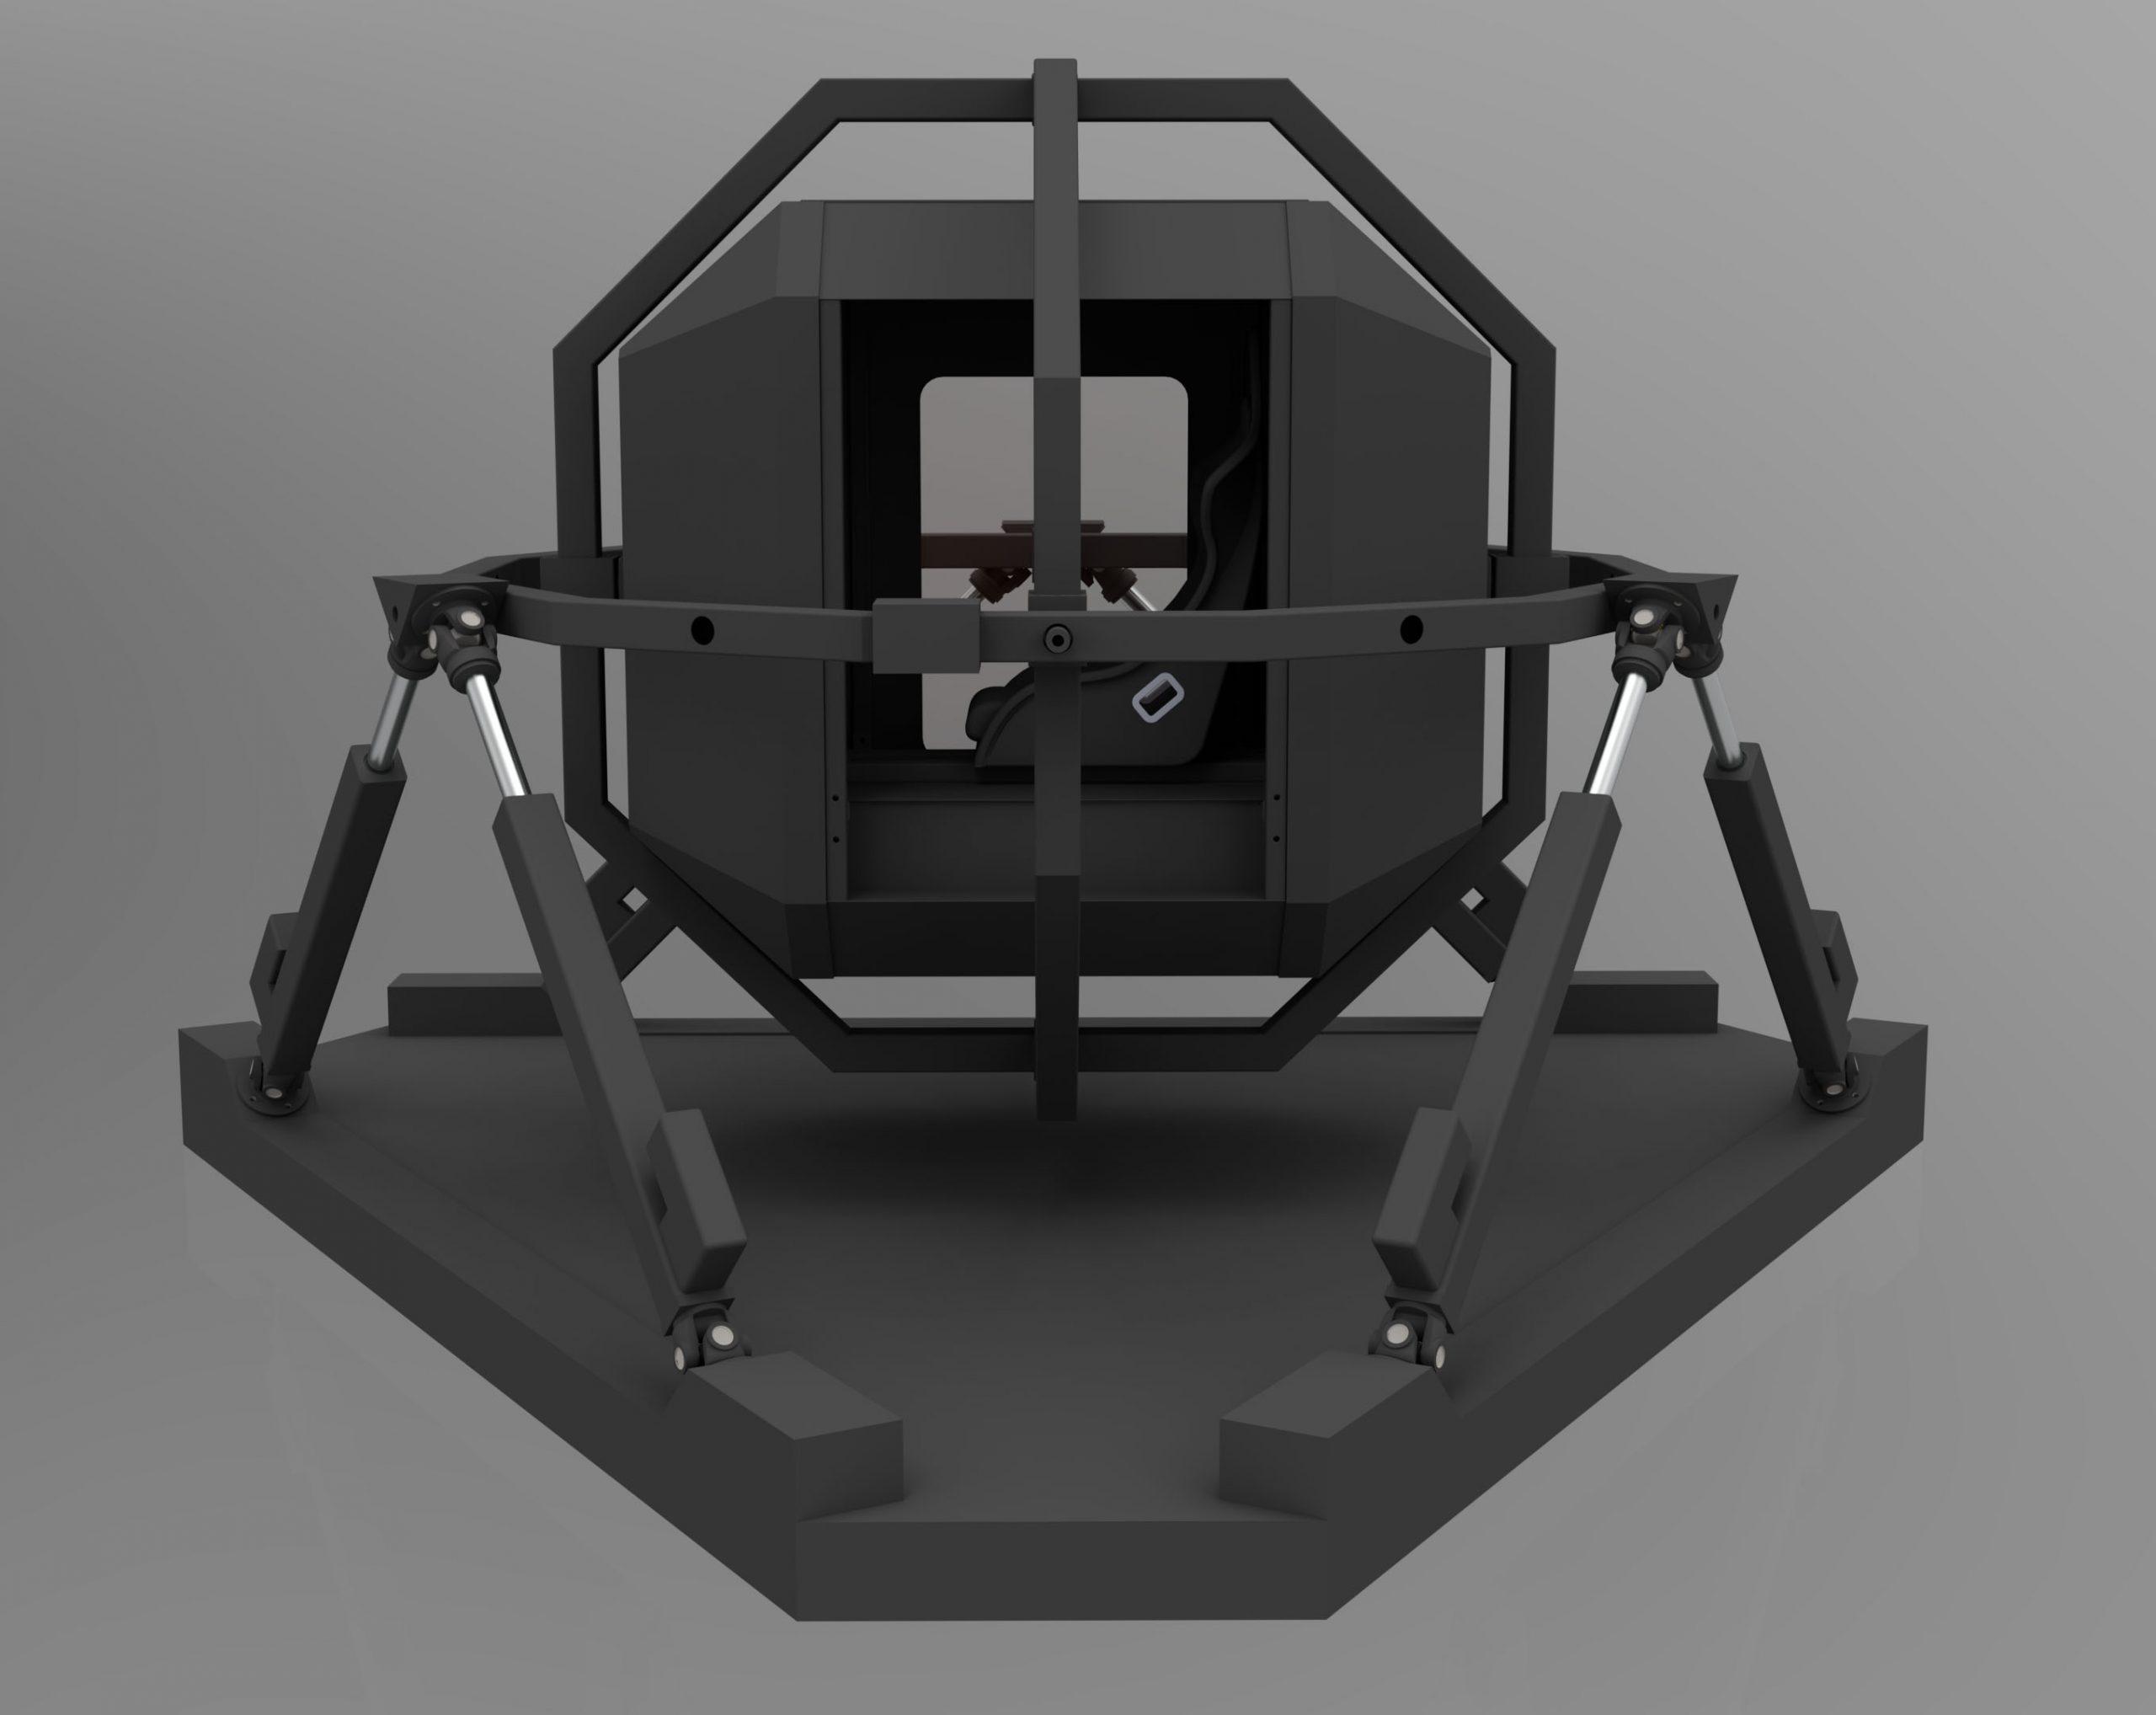 6dof VR Simulator